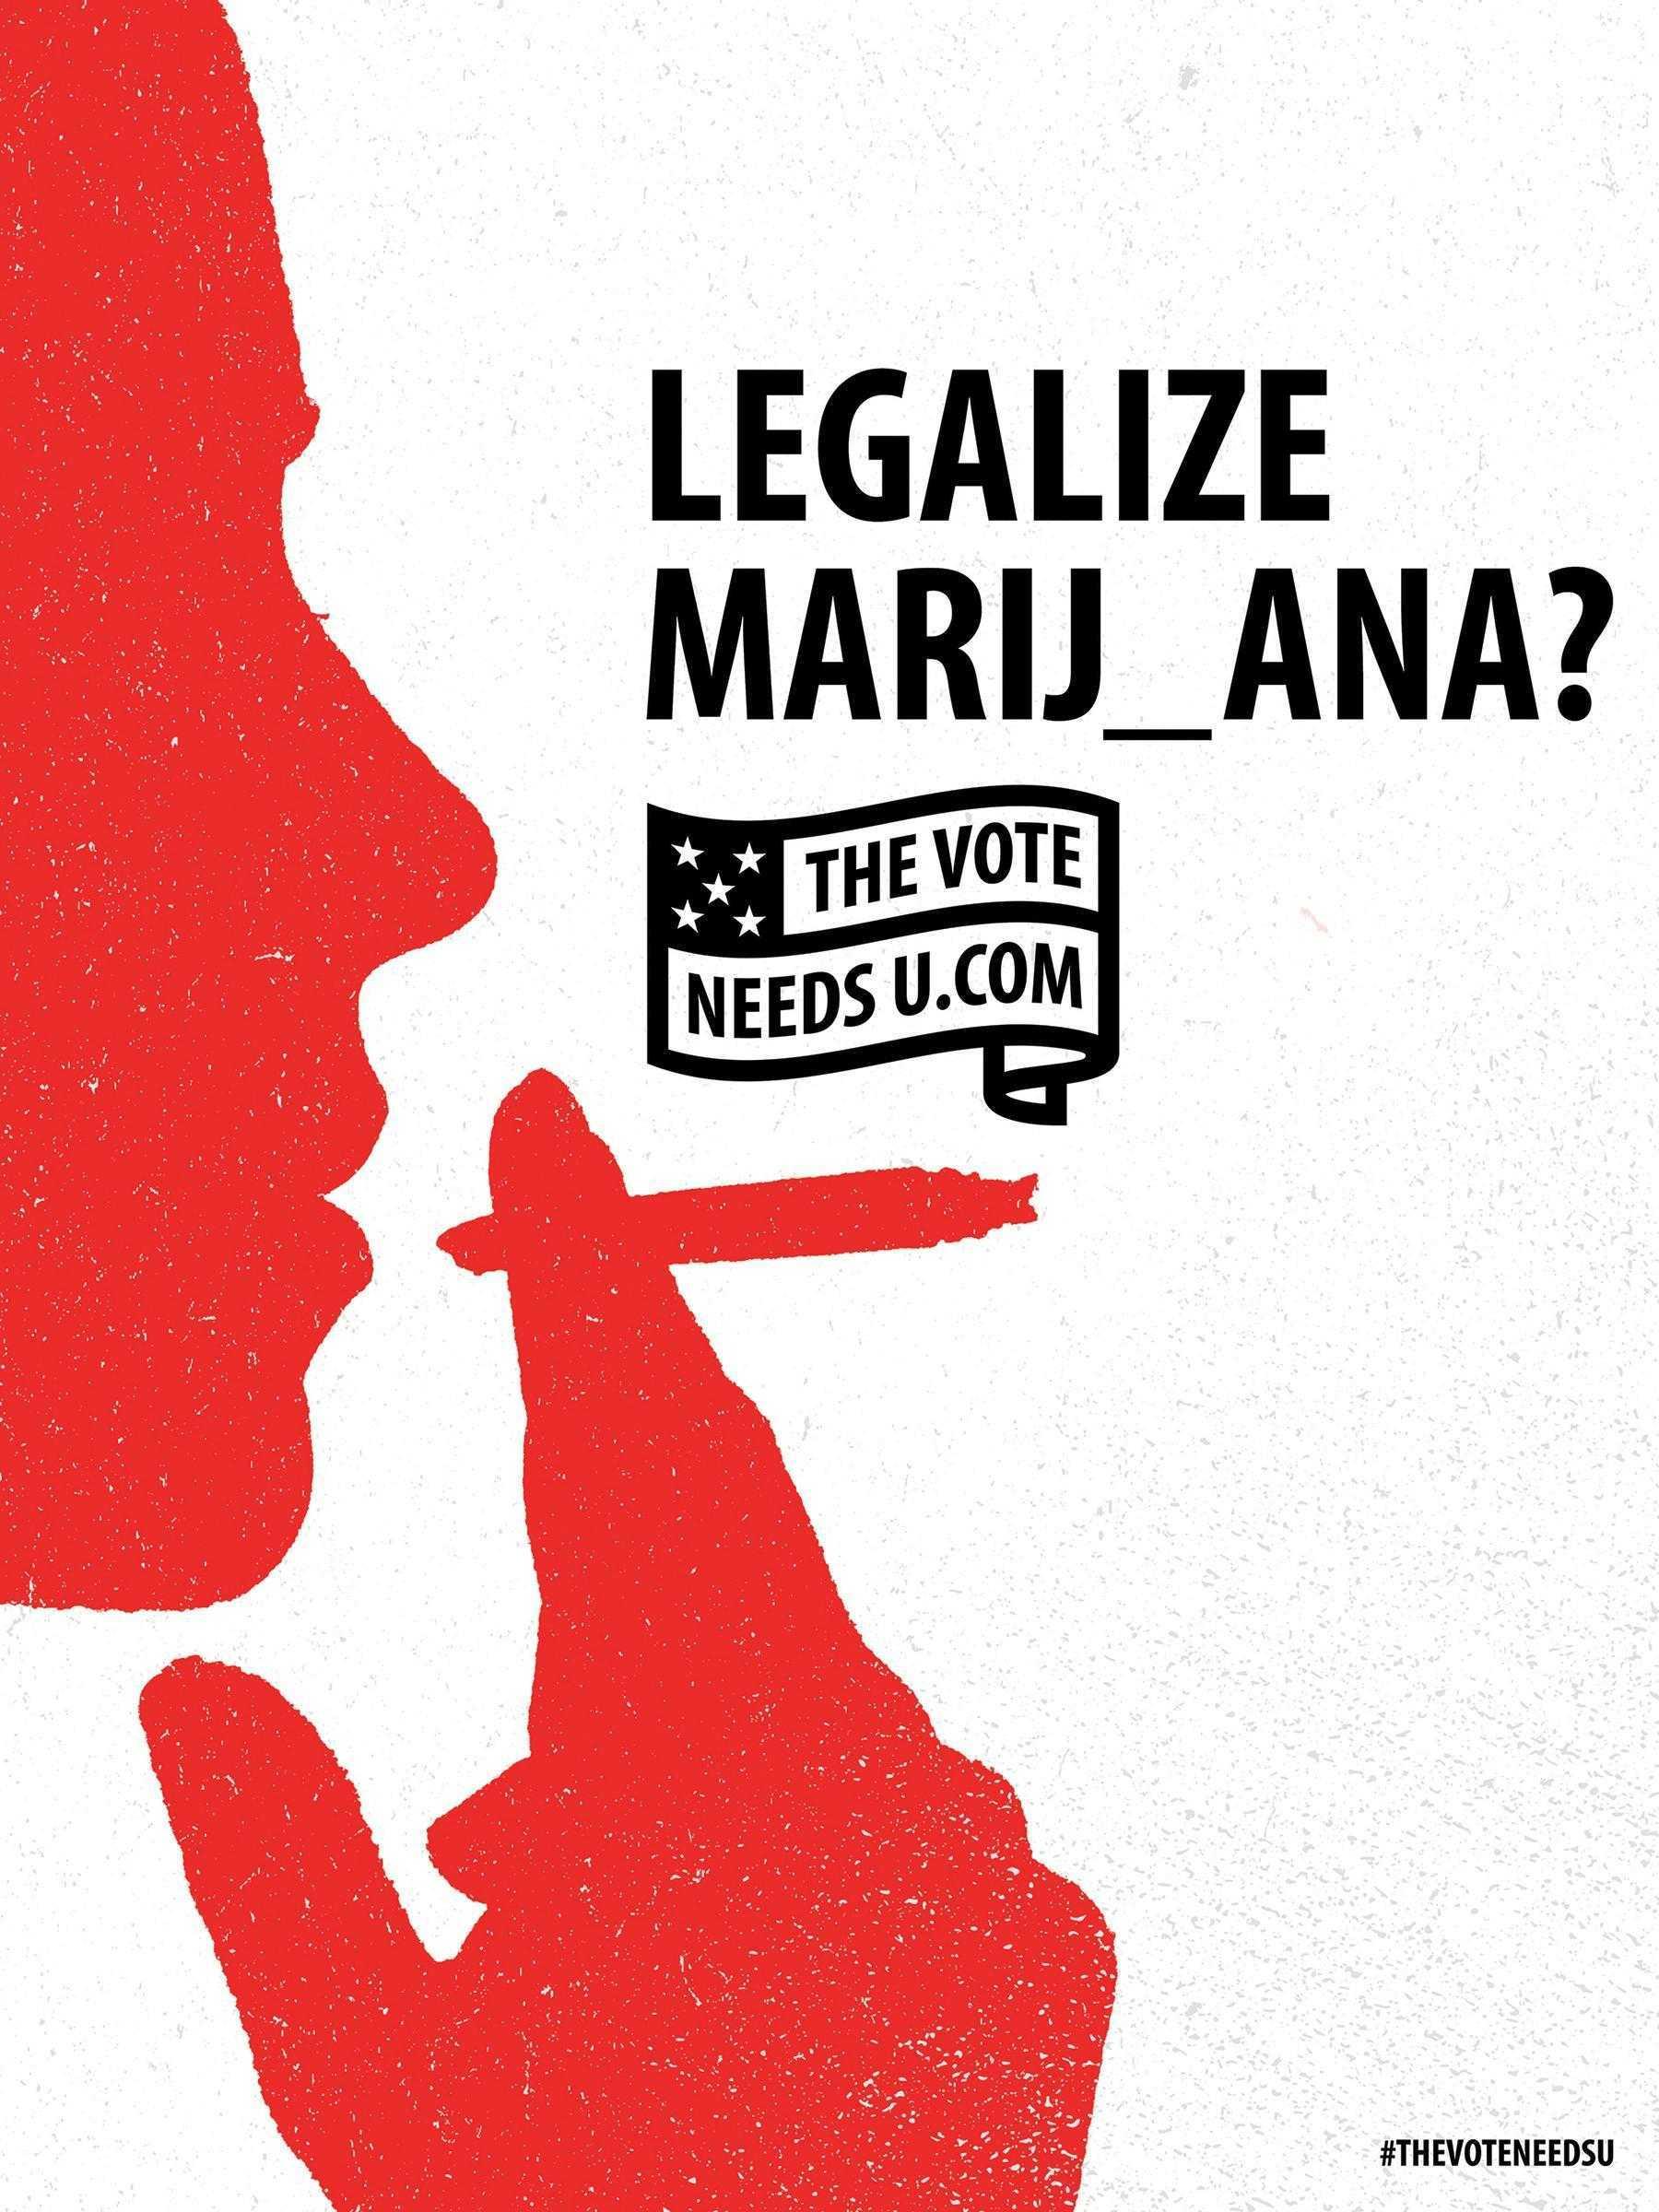 thevoteneedsu_posters_marijuana_aotw_0